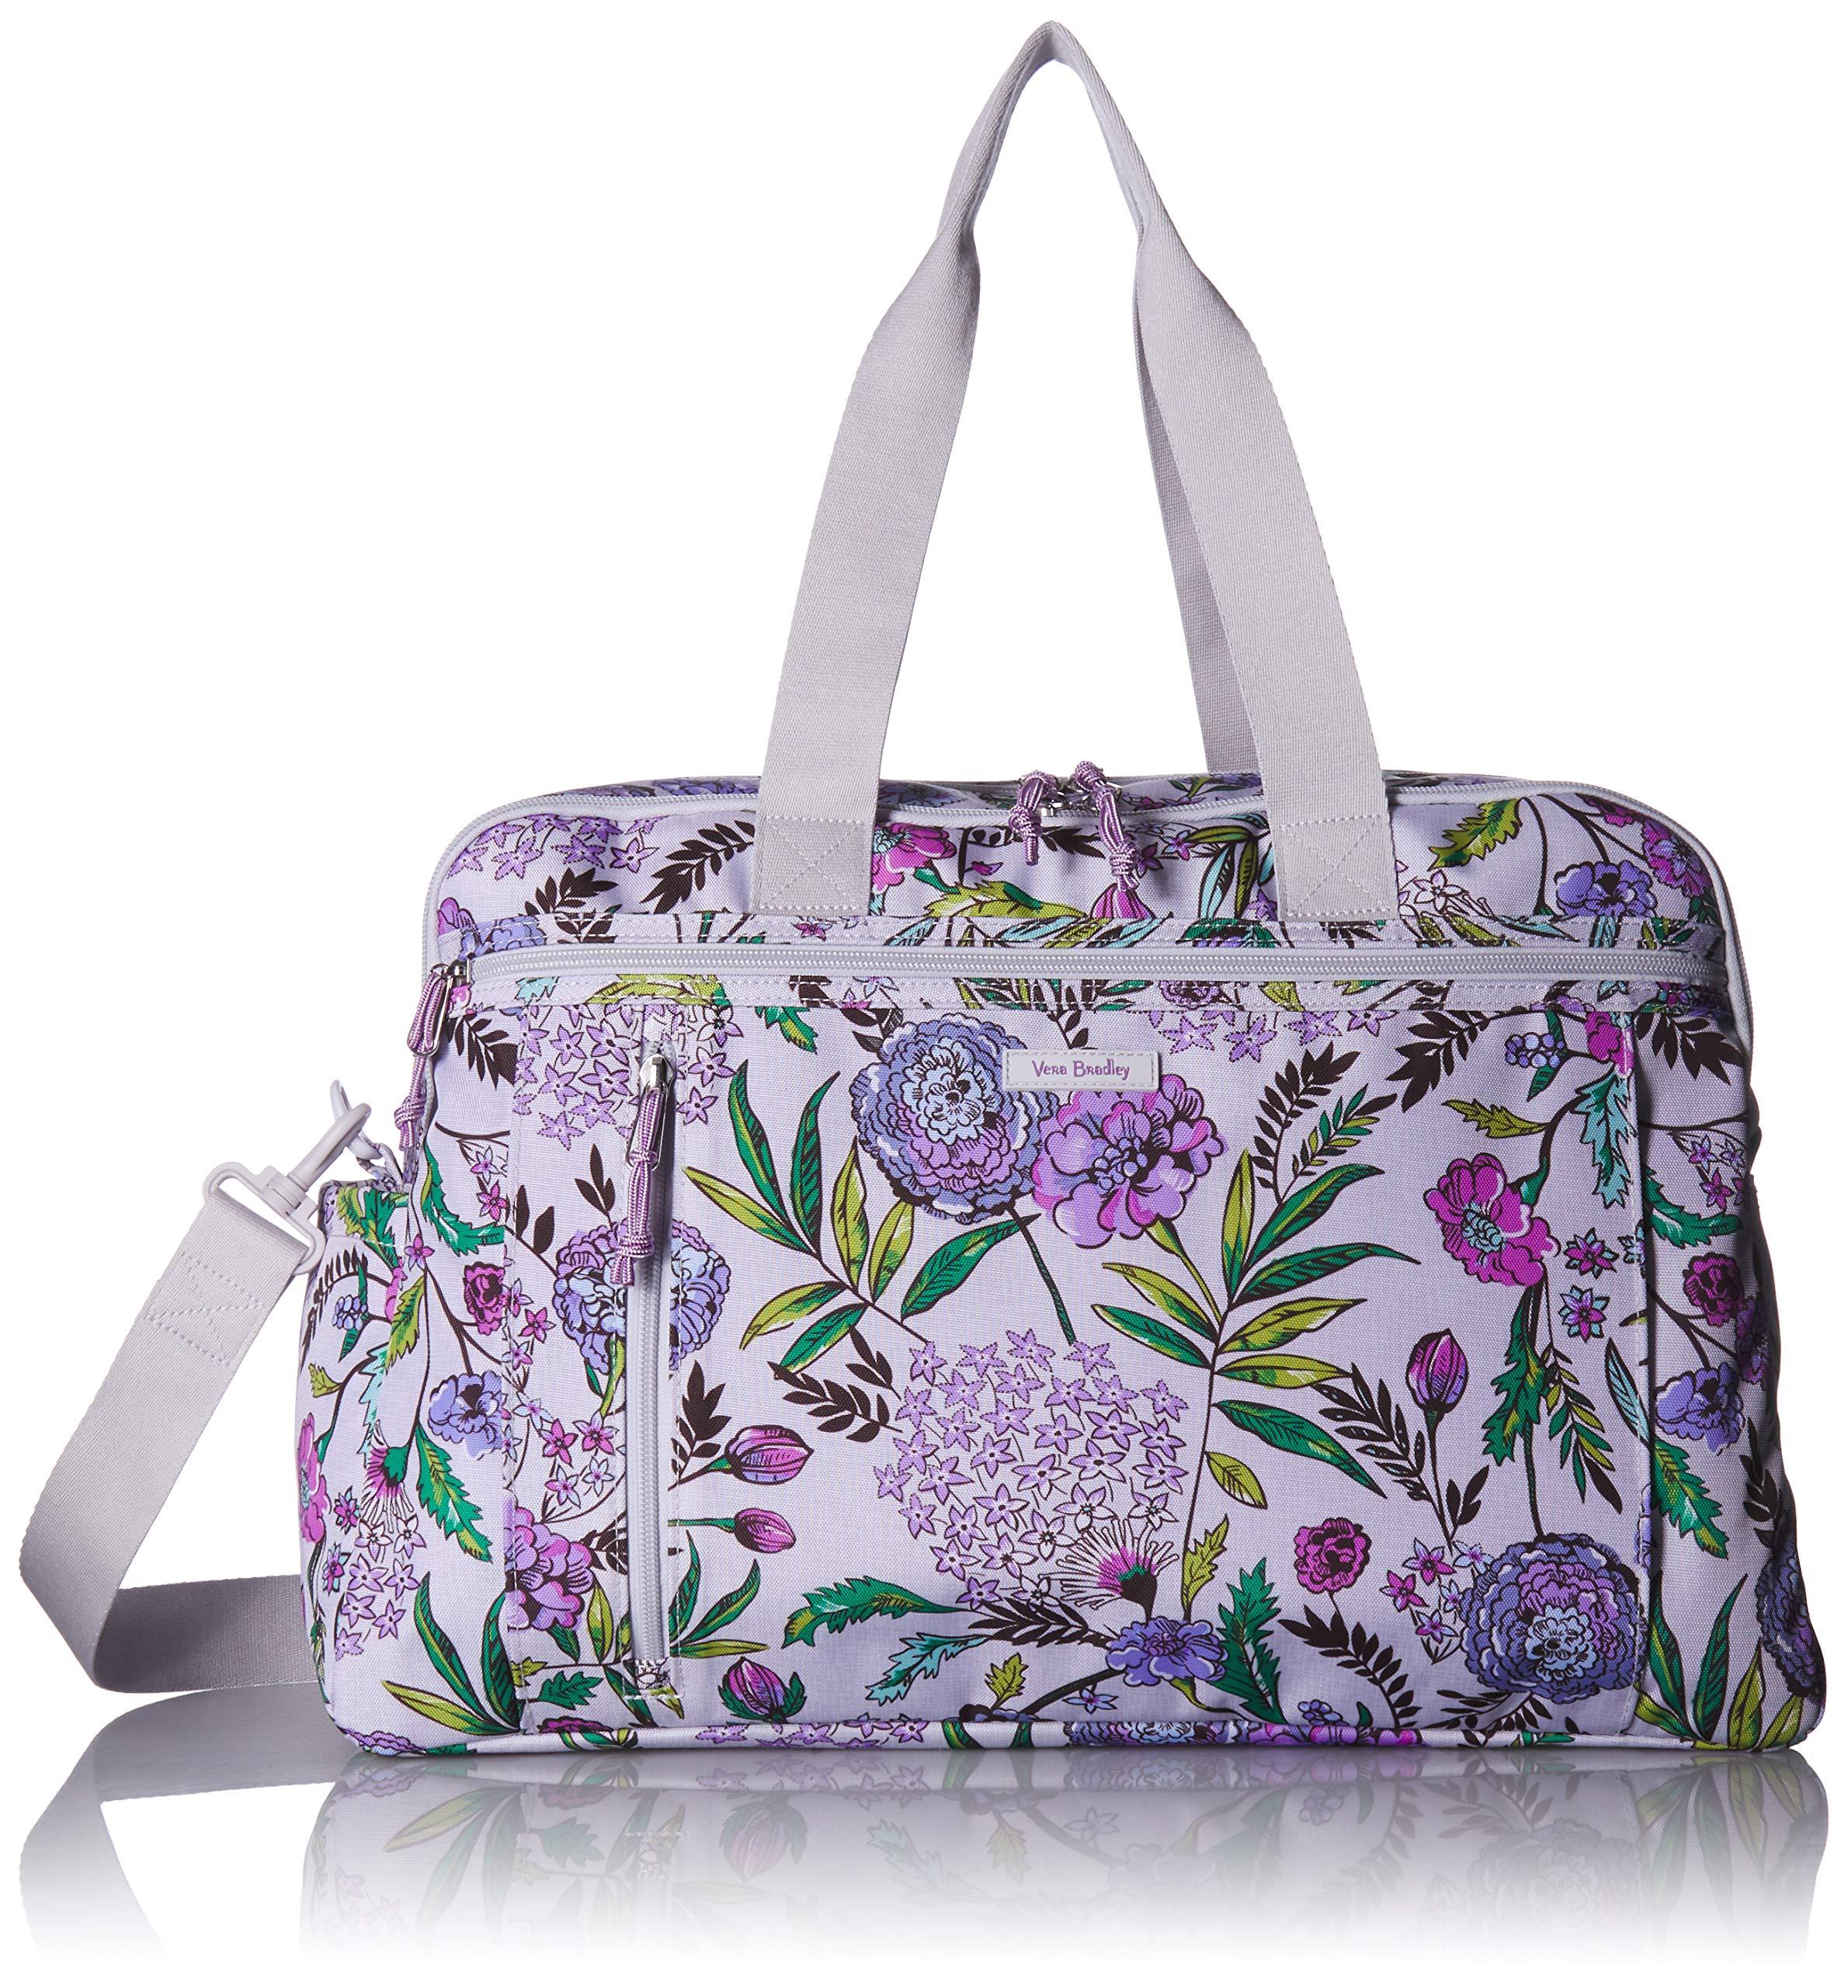 Vera Bradley Lighten Up Weekender Travel Bag, Lavender Botanical